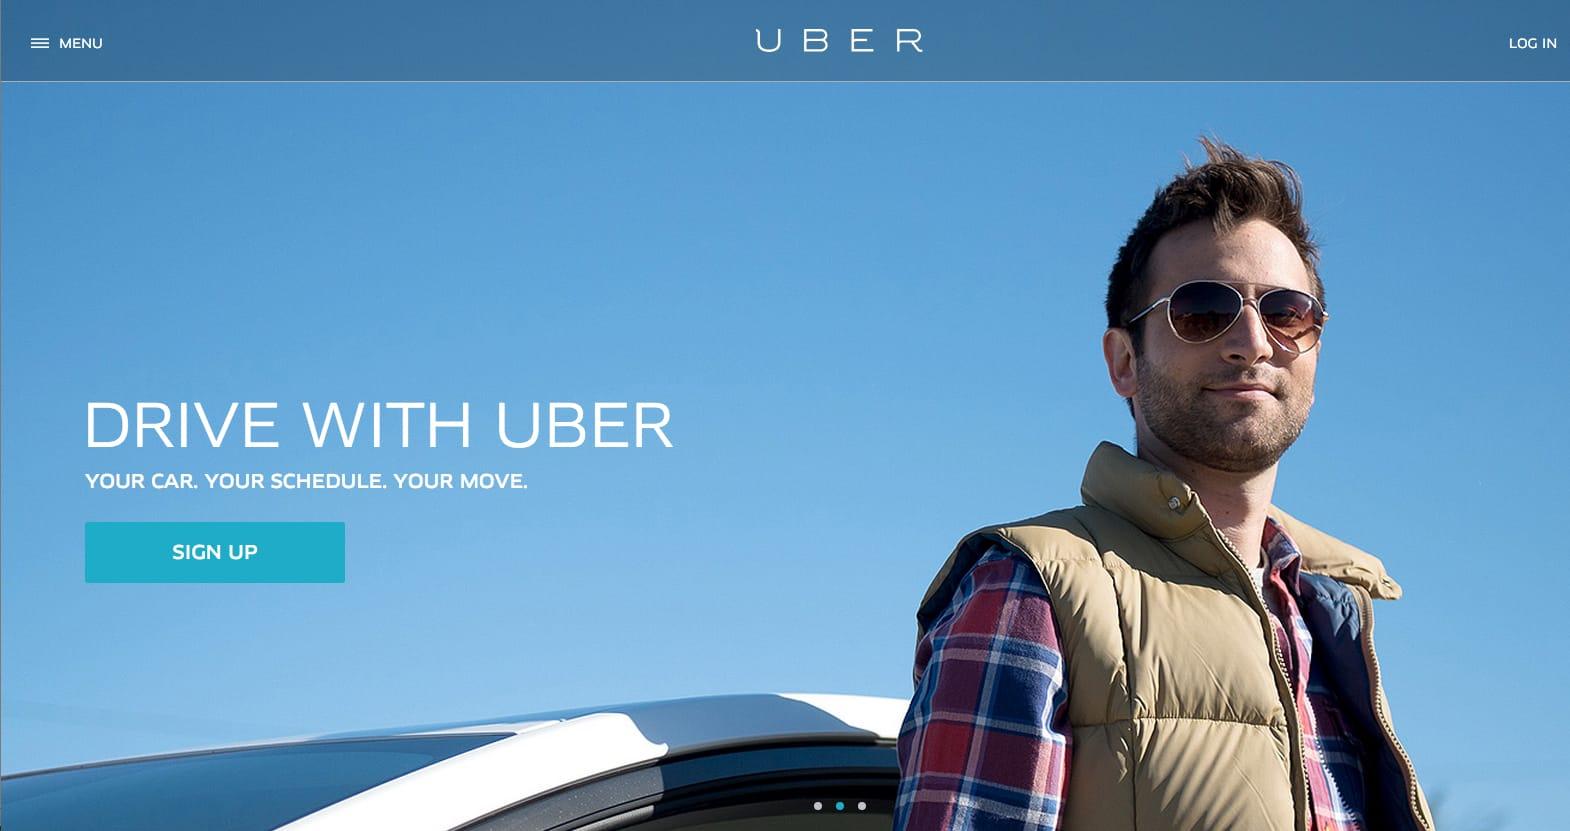 Uber in Costa Rica: Screenshot of Uber driver